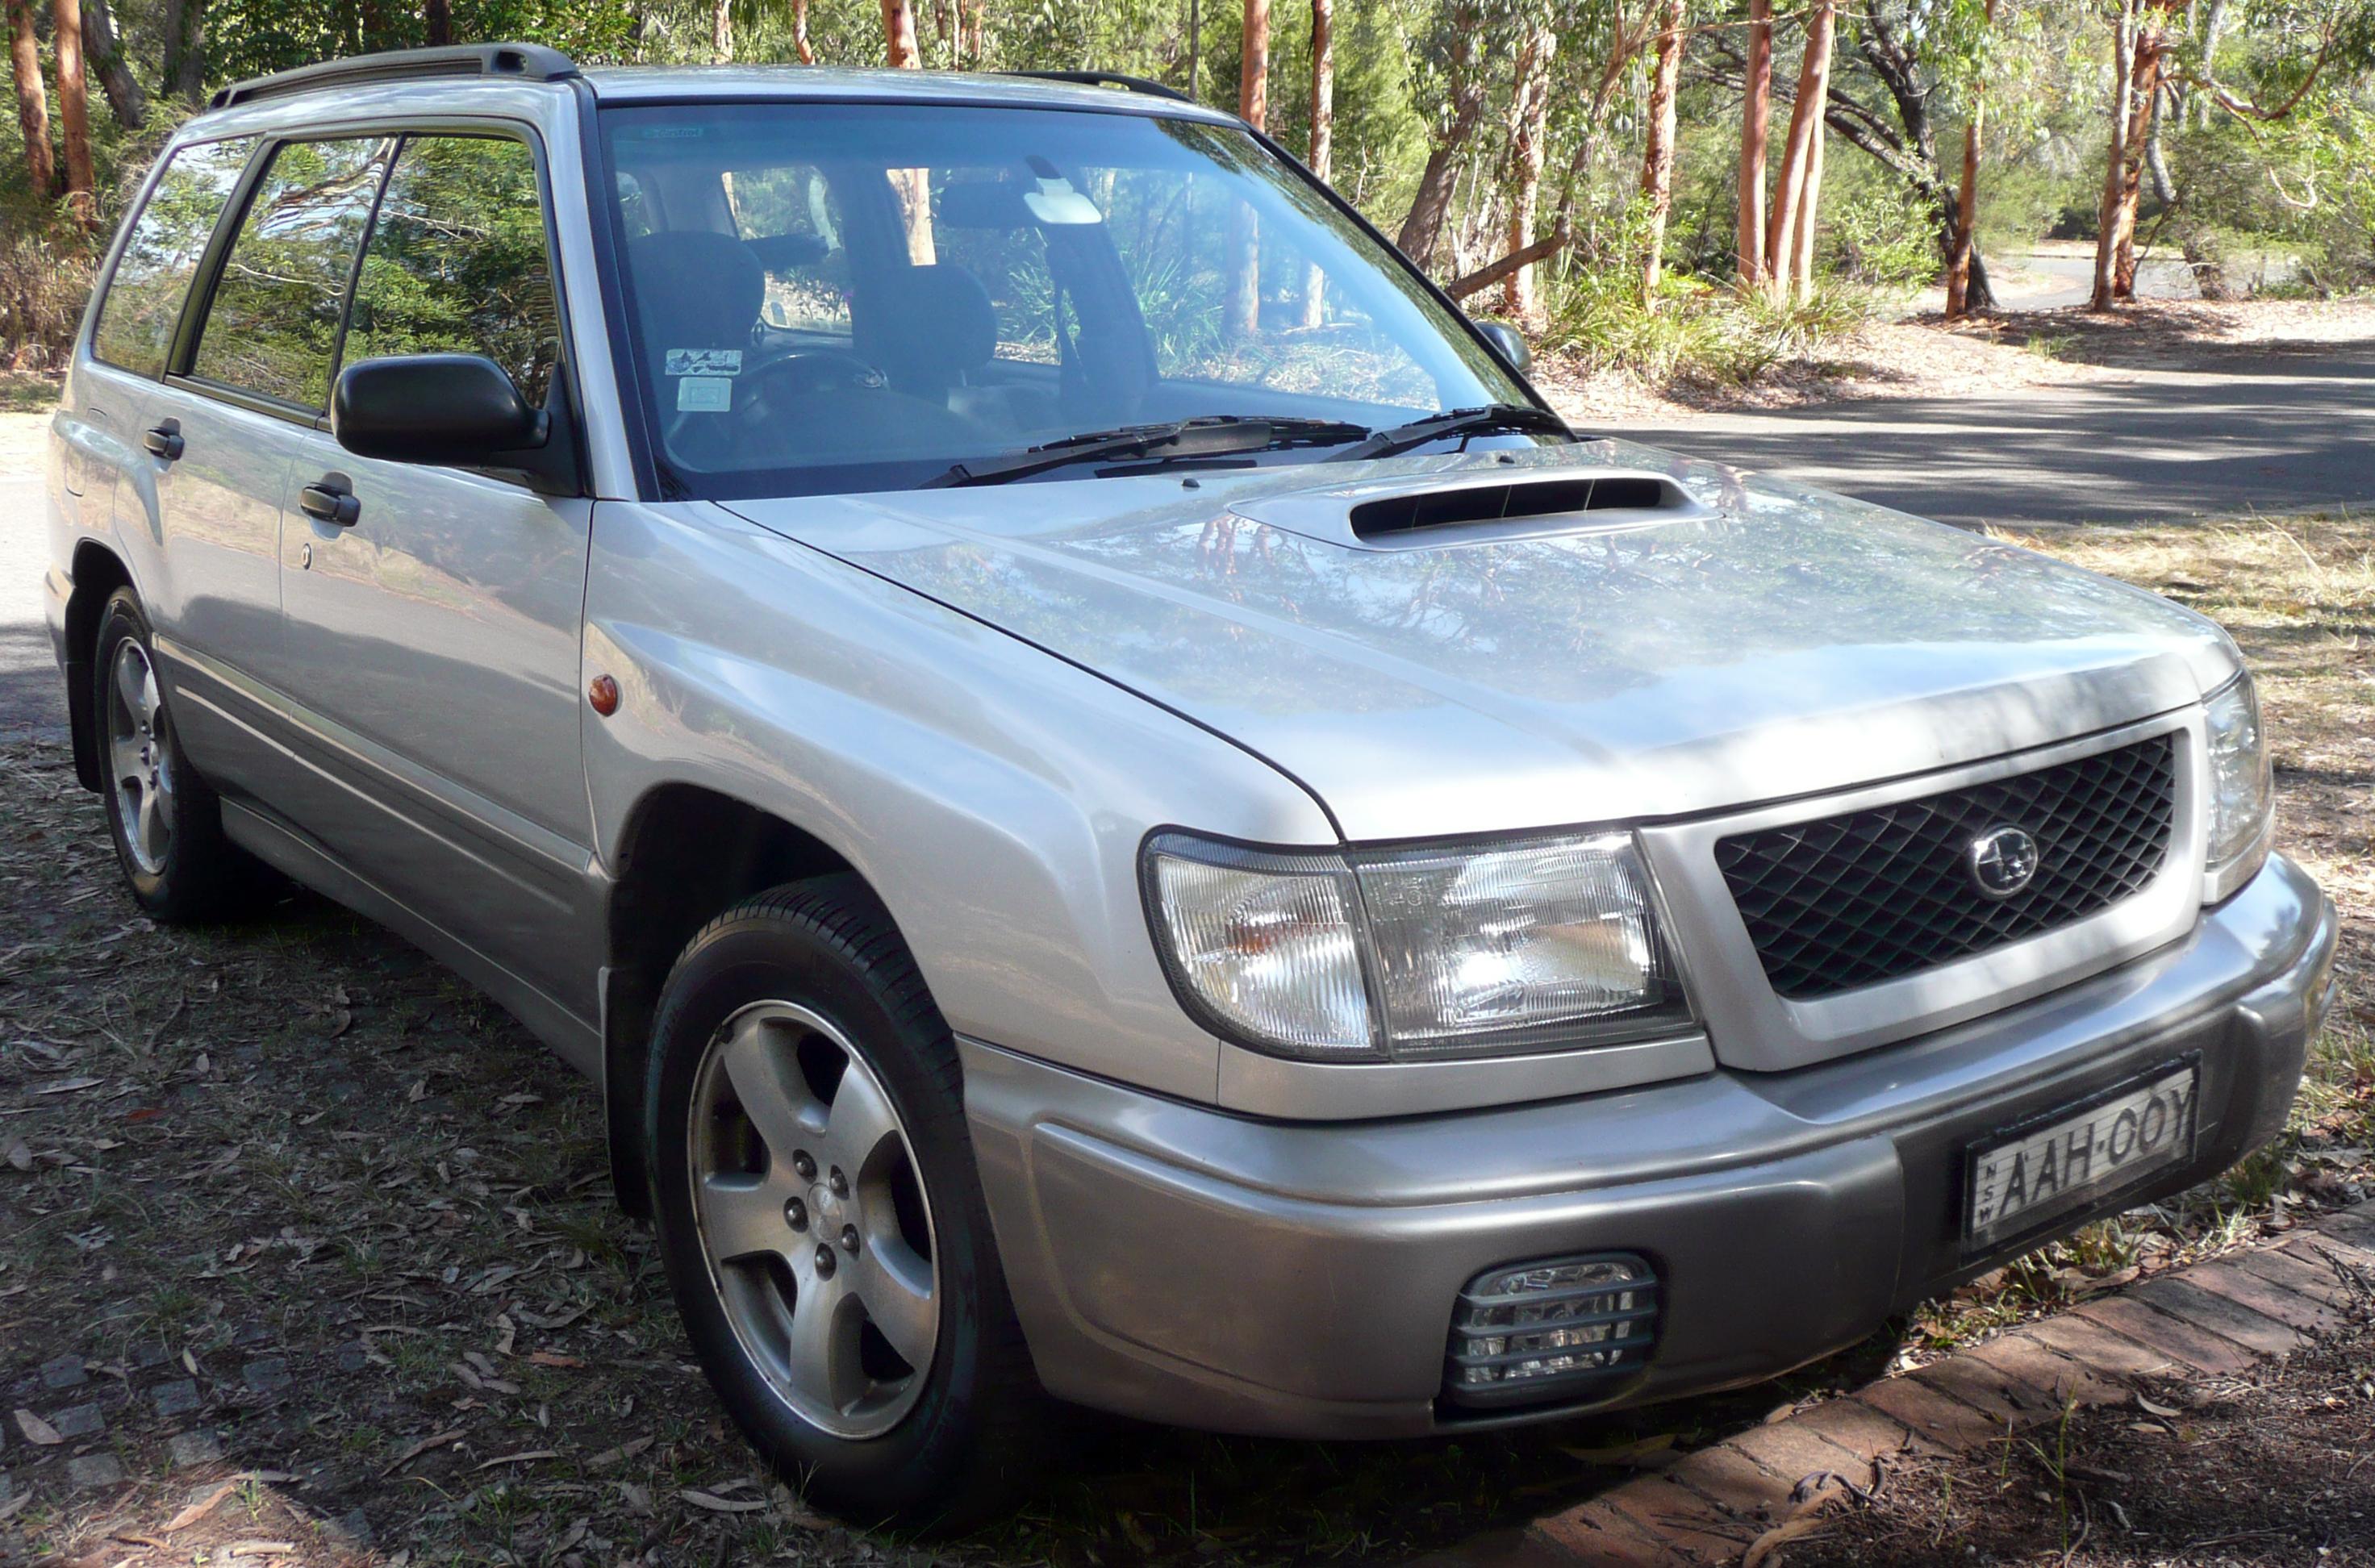 file:1998-1999 subaru forester (sf5 my99) gt wagon (2009-01-31) 02